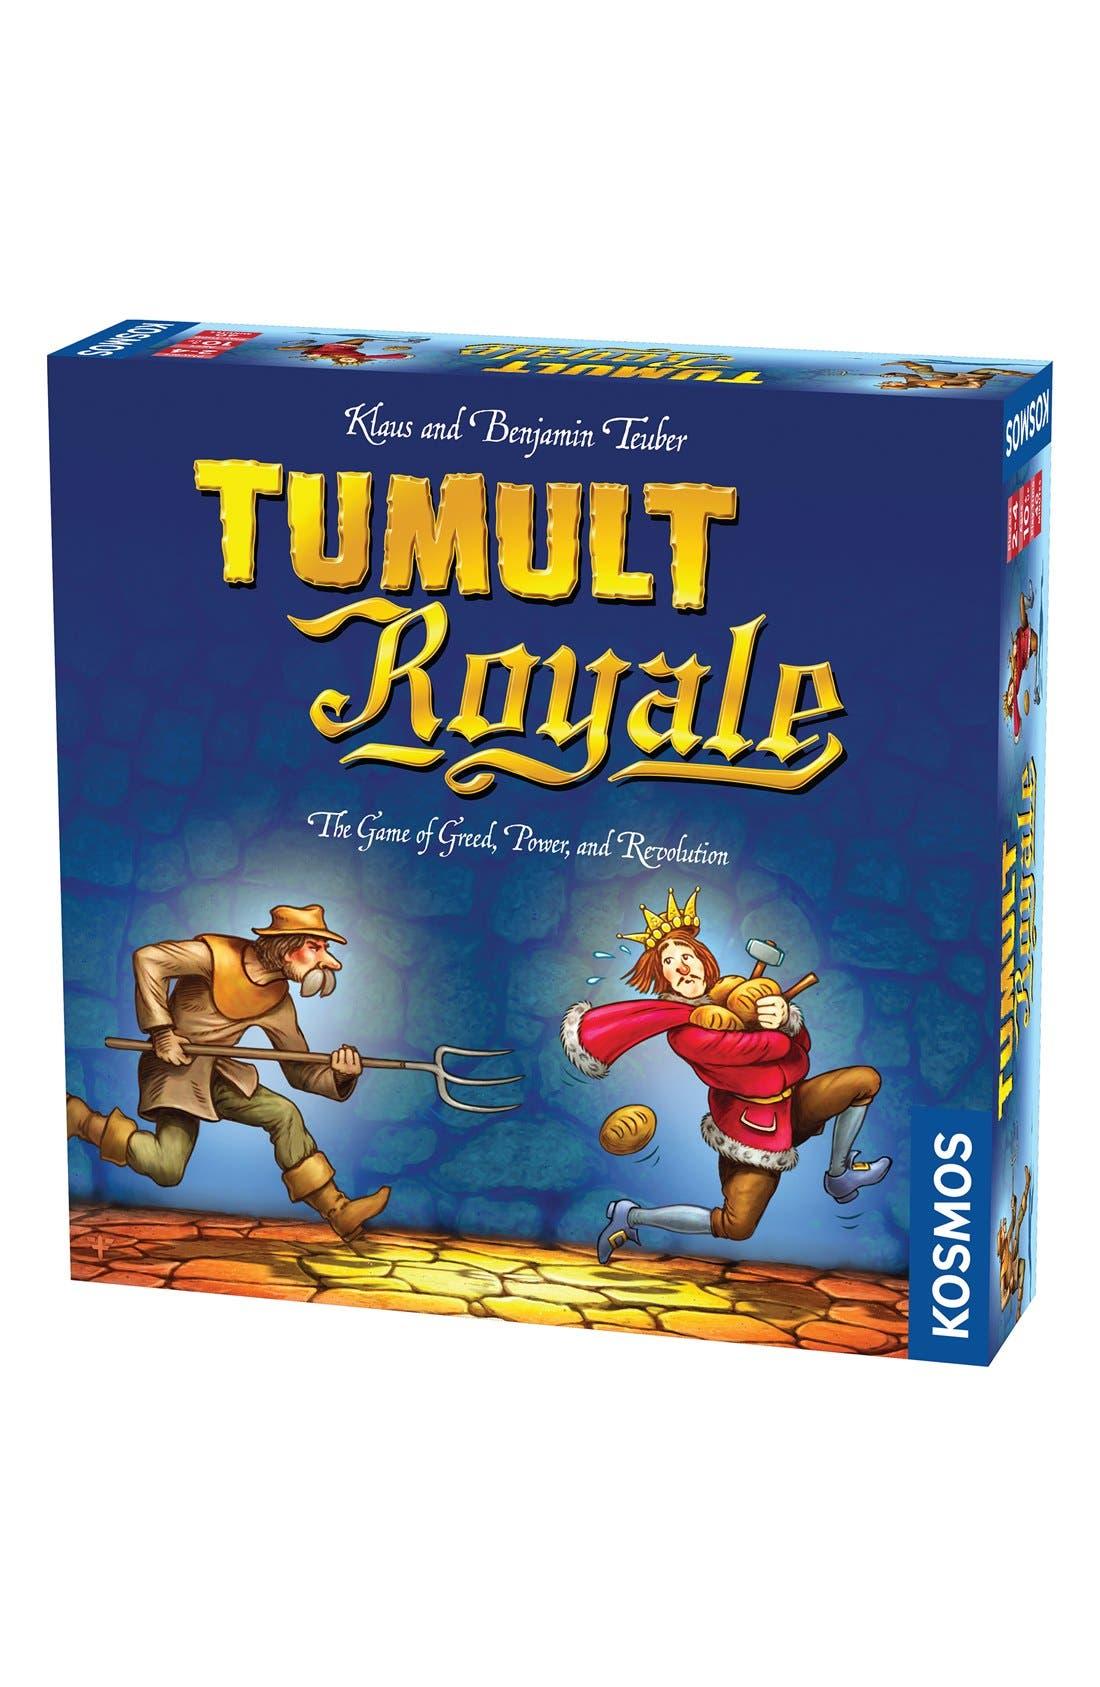 'Tumult Royale' Board Game,                             Main thumbnail 1, color,                             400